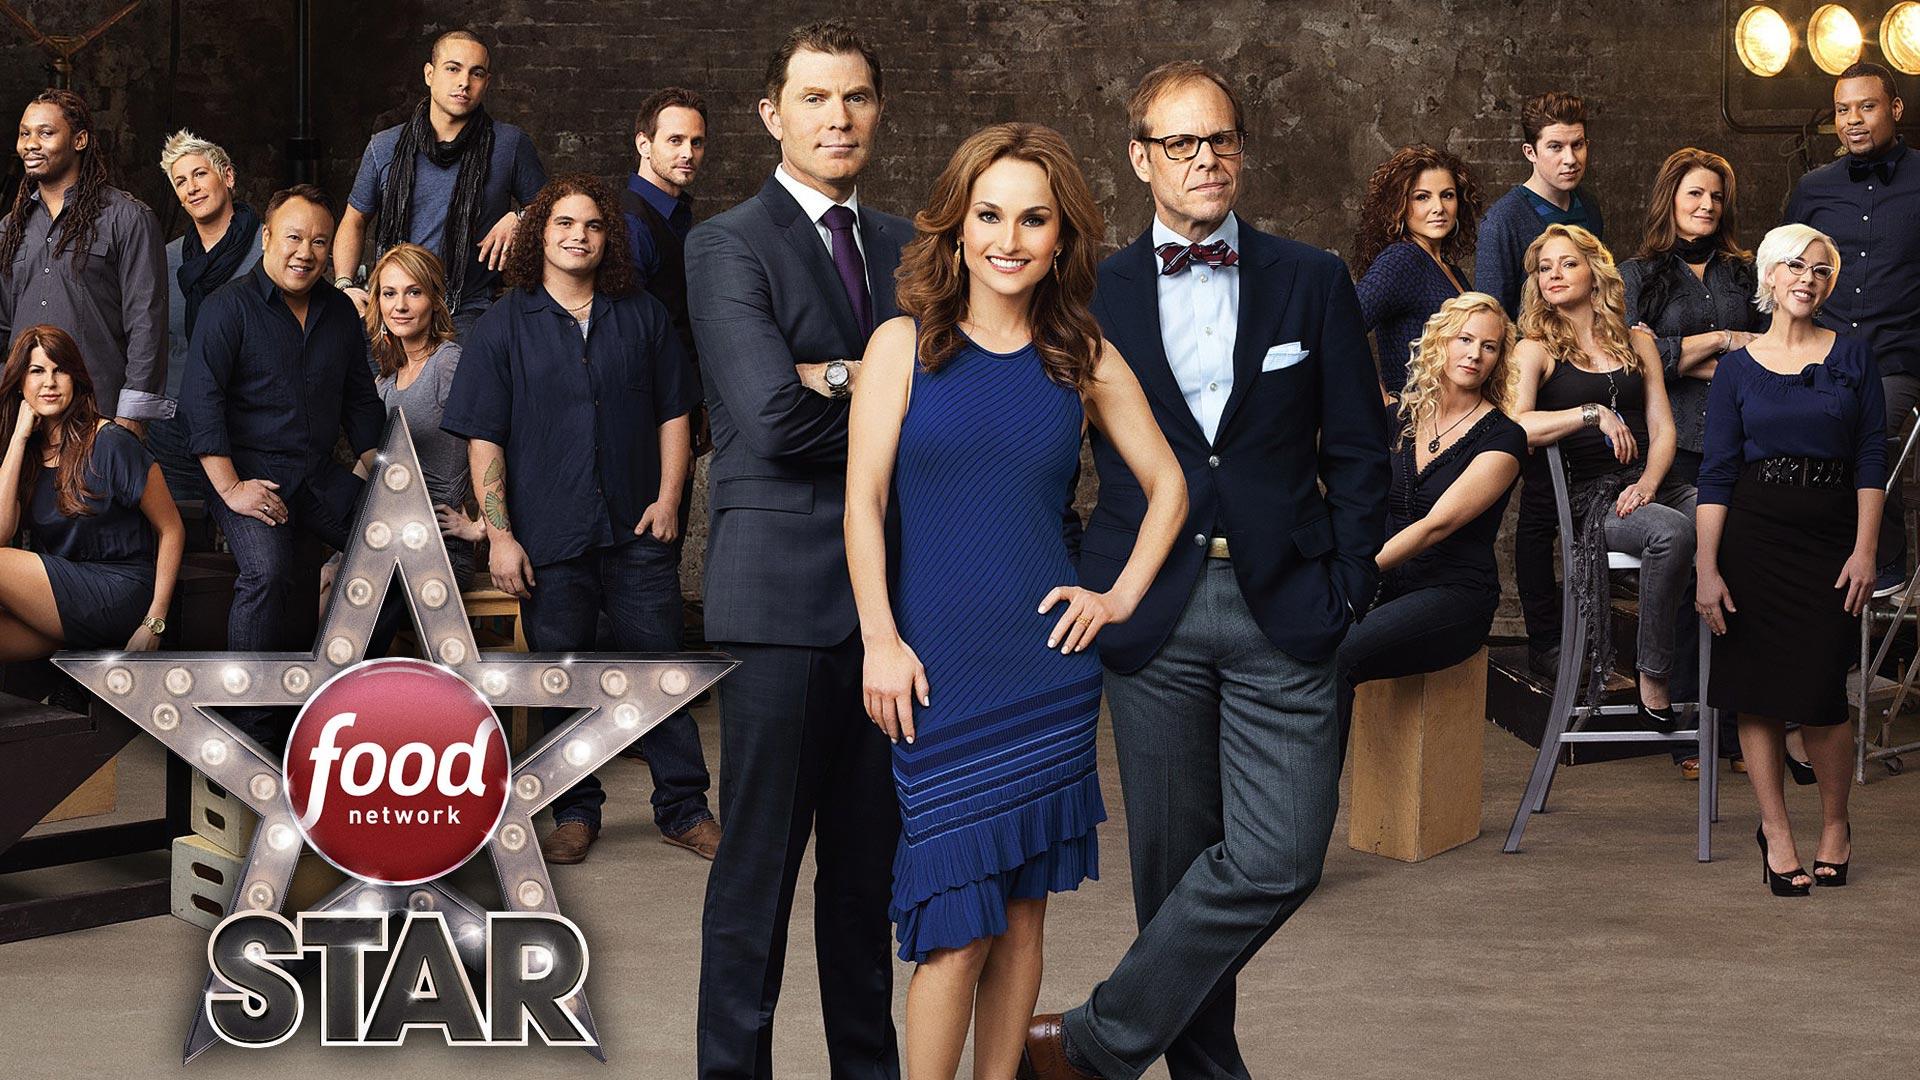 Food Network Star Season 8